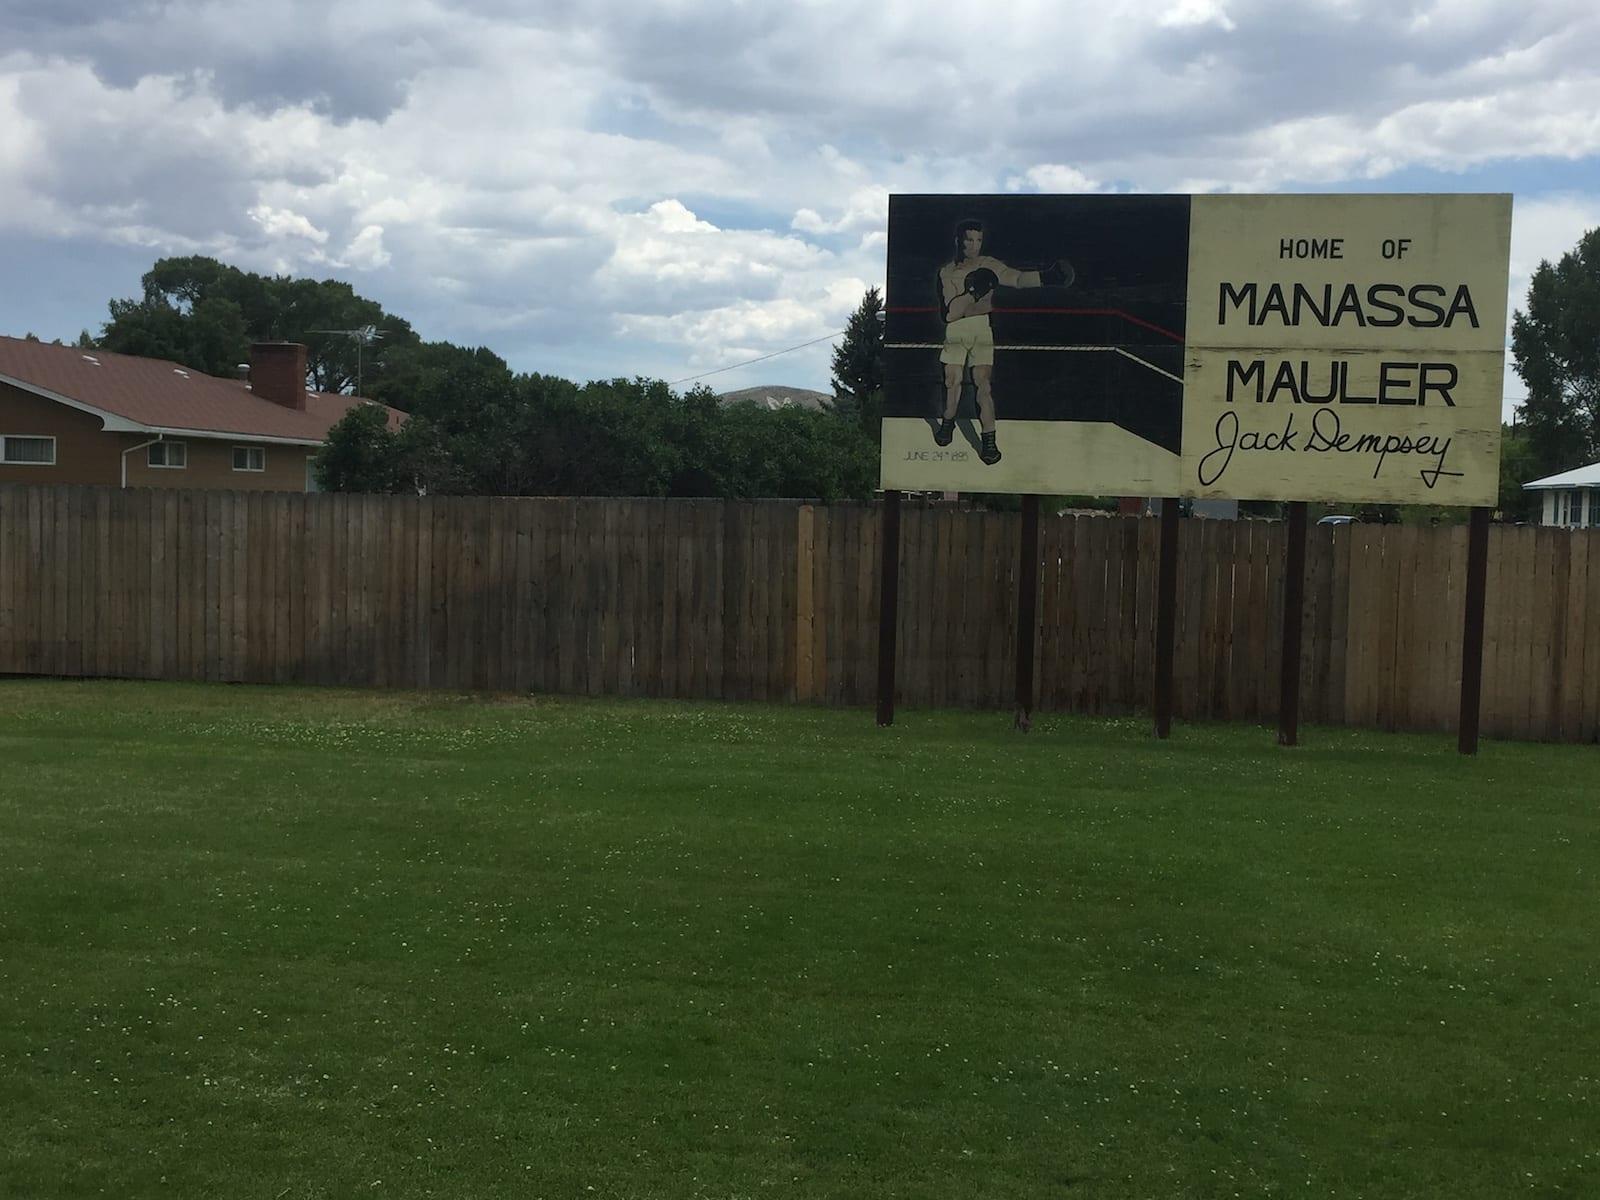 Home of Manassa Mauler Jack Dempsey